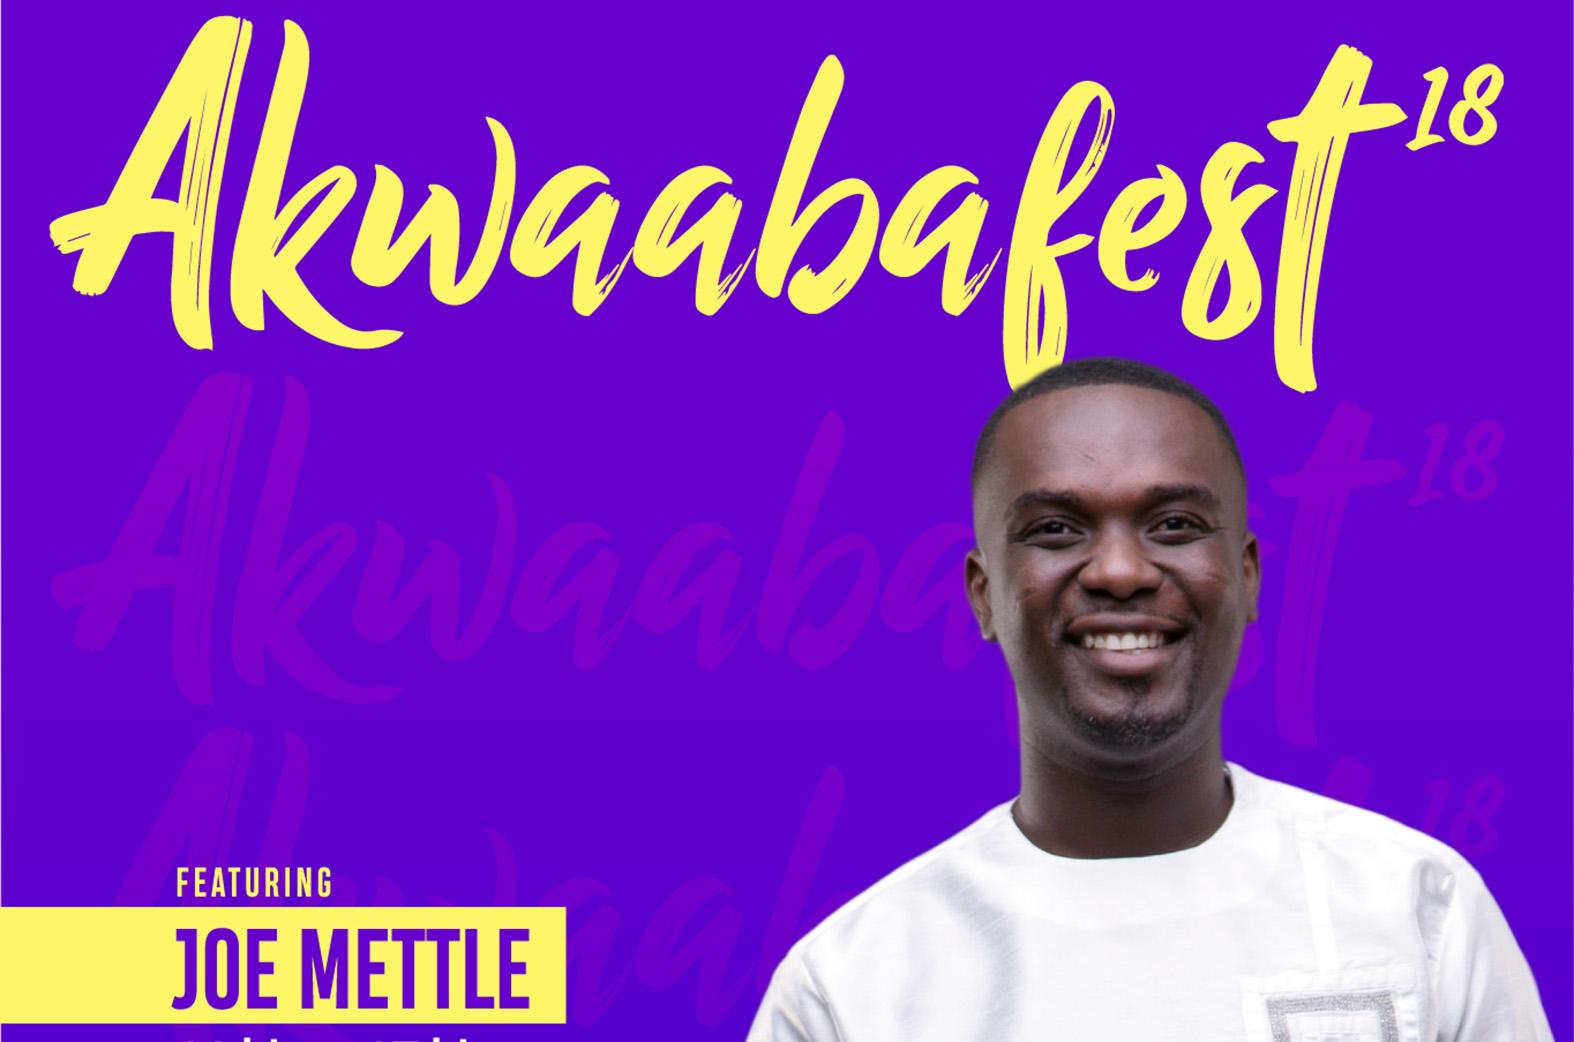 Joe Mettle to trill at KNUST AkwaabaFest 2018